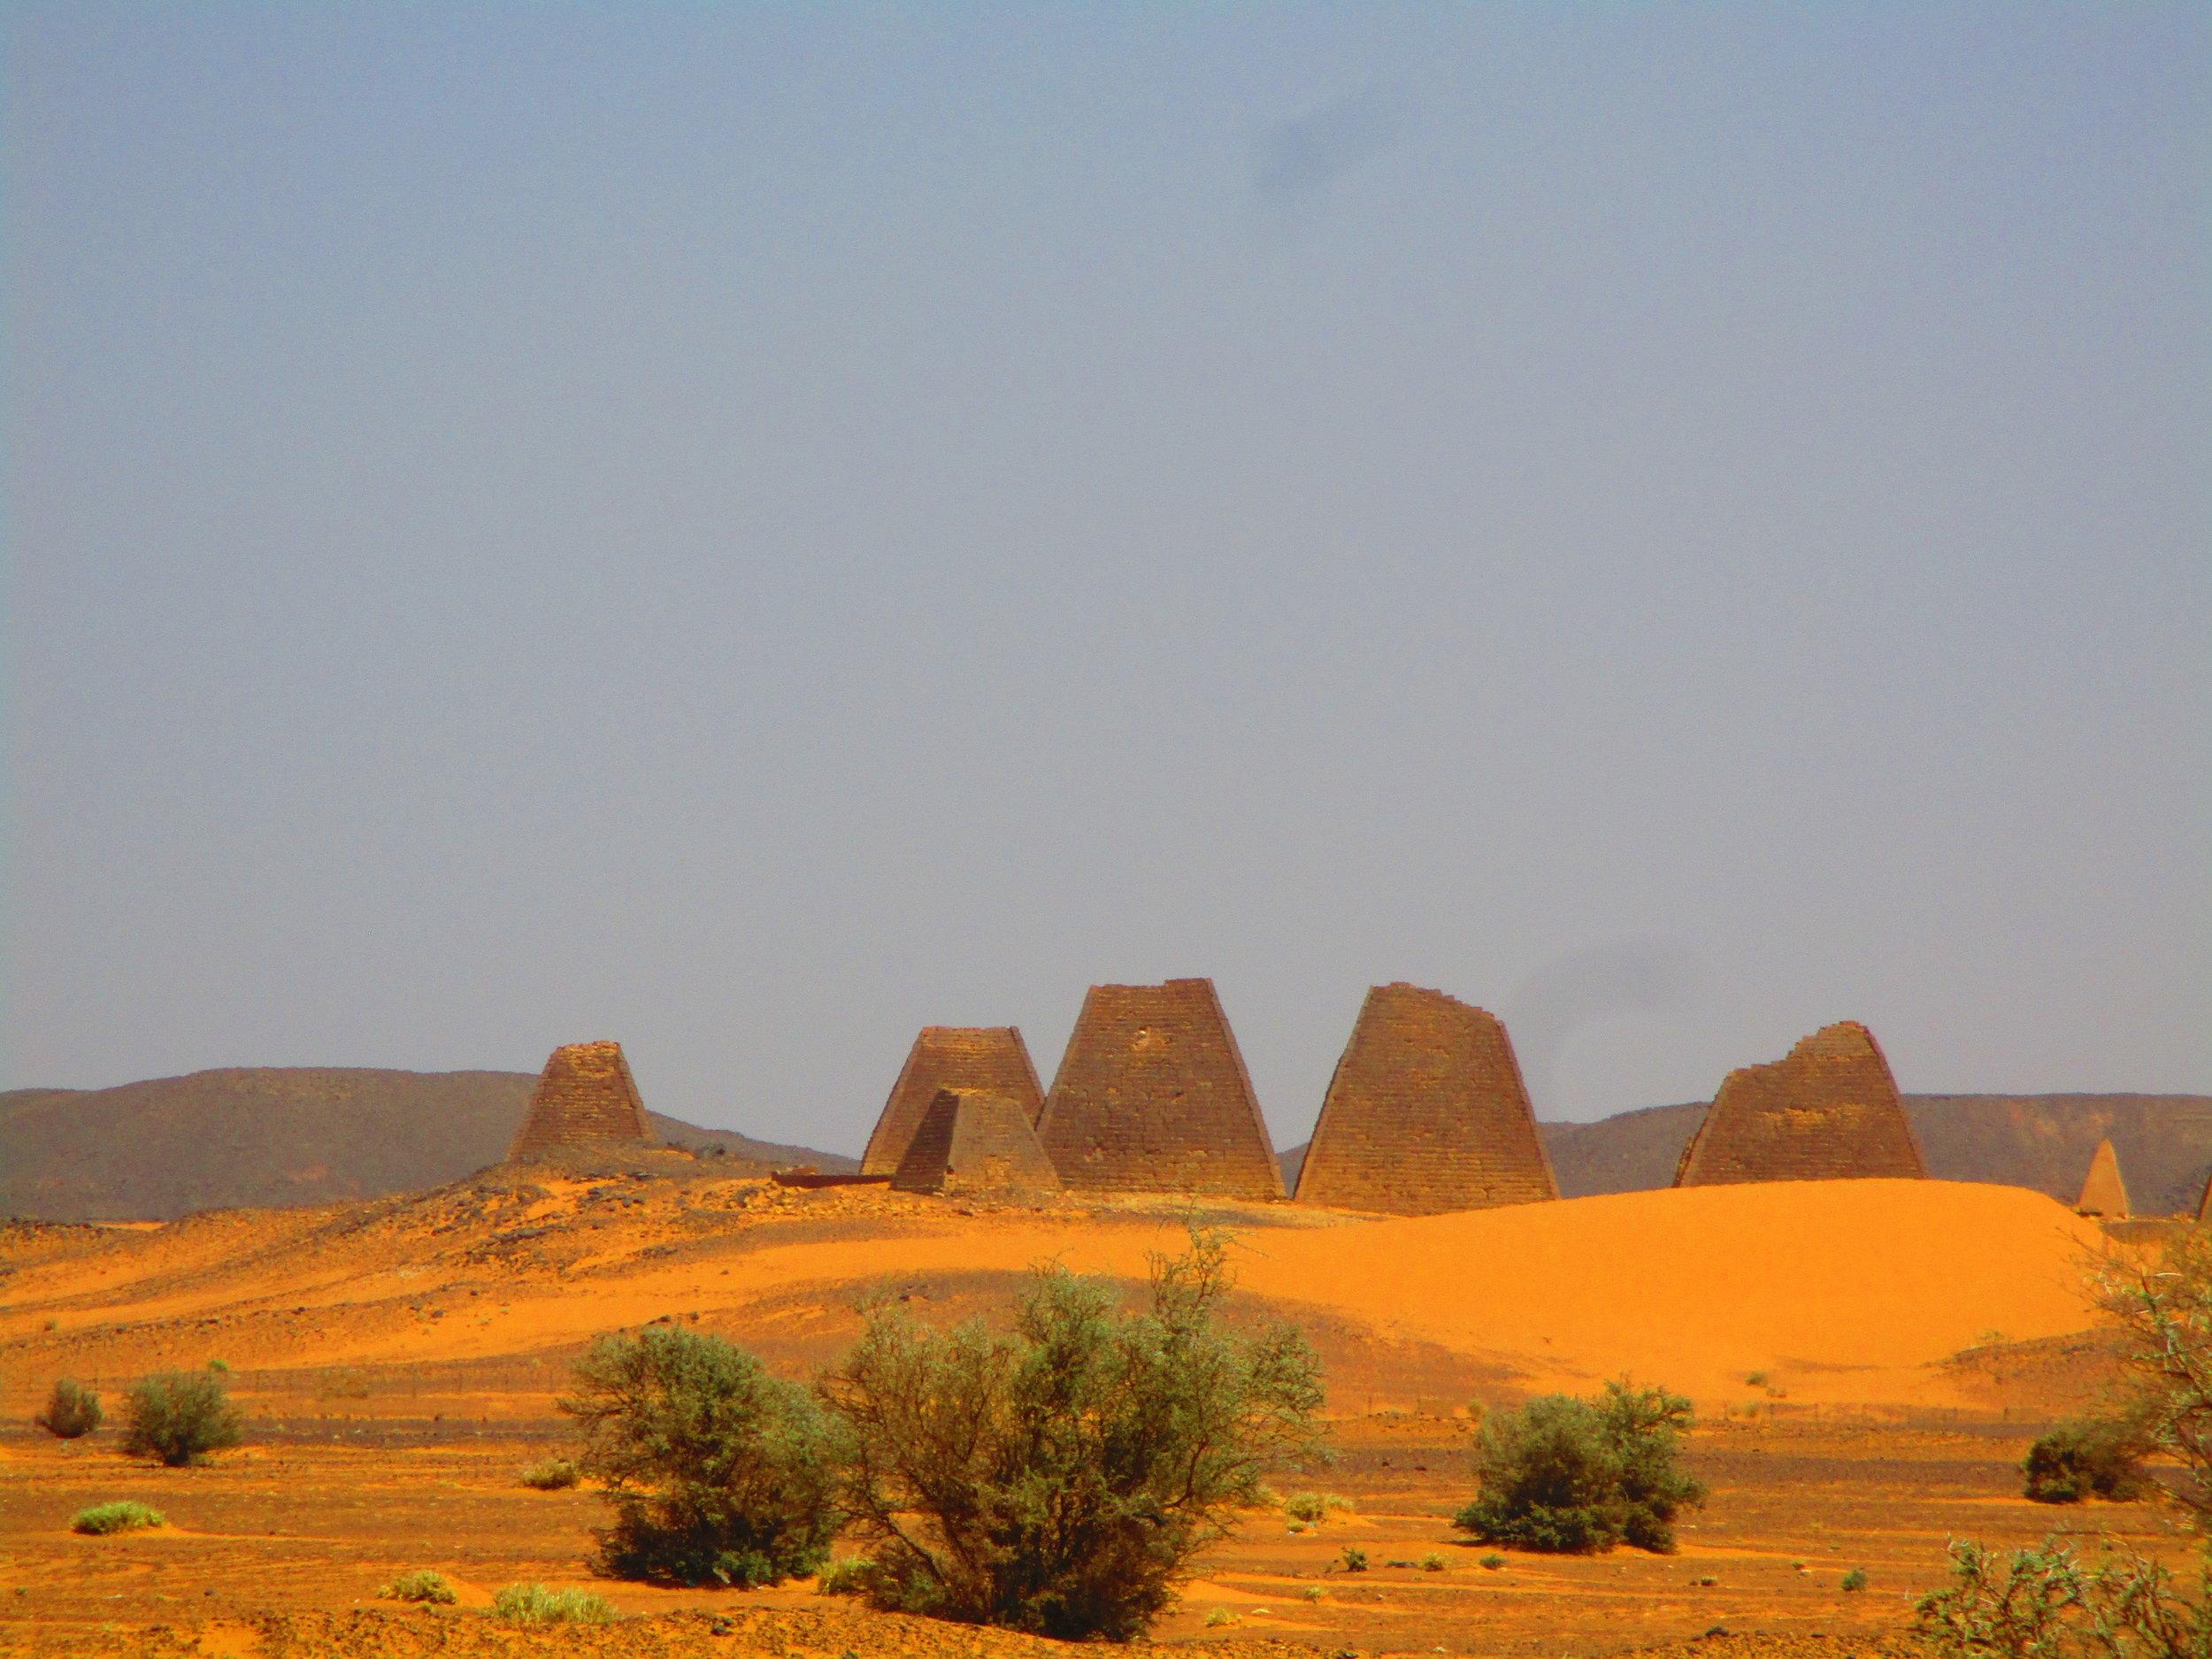 Pyramids of Meroe -en-route from Khartoum to Atbara